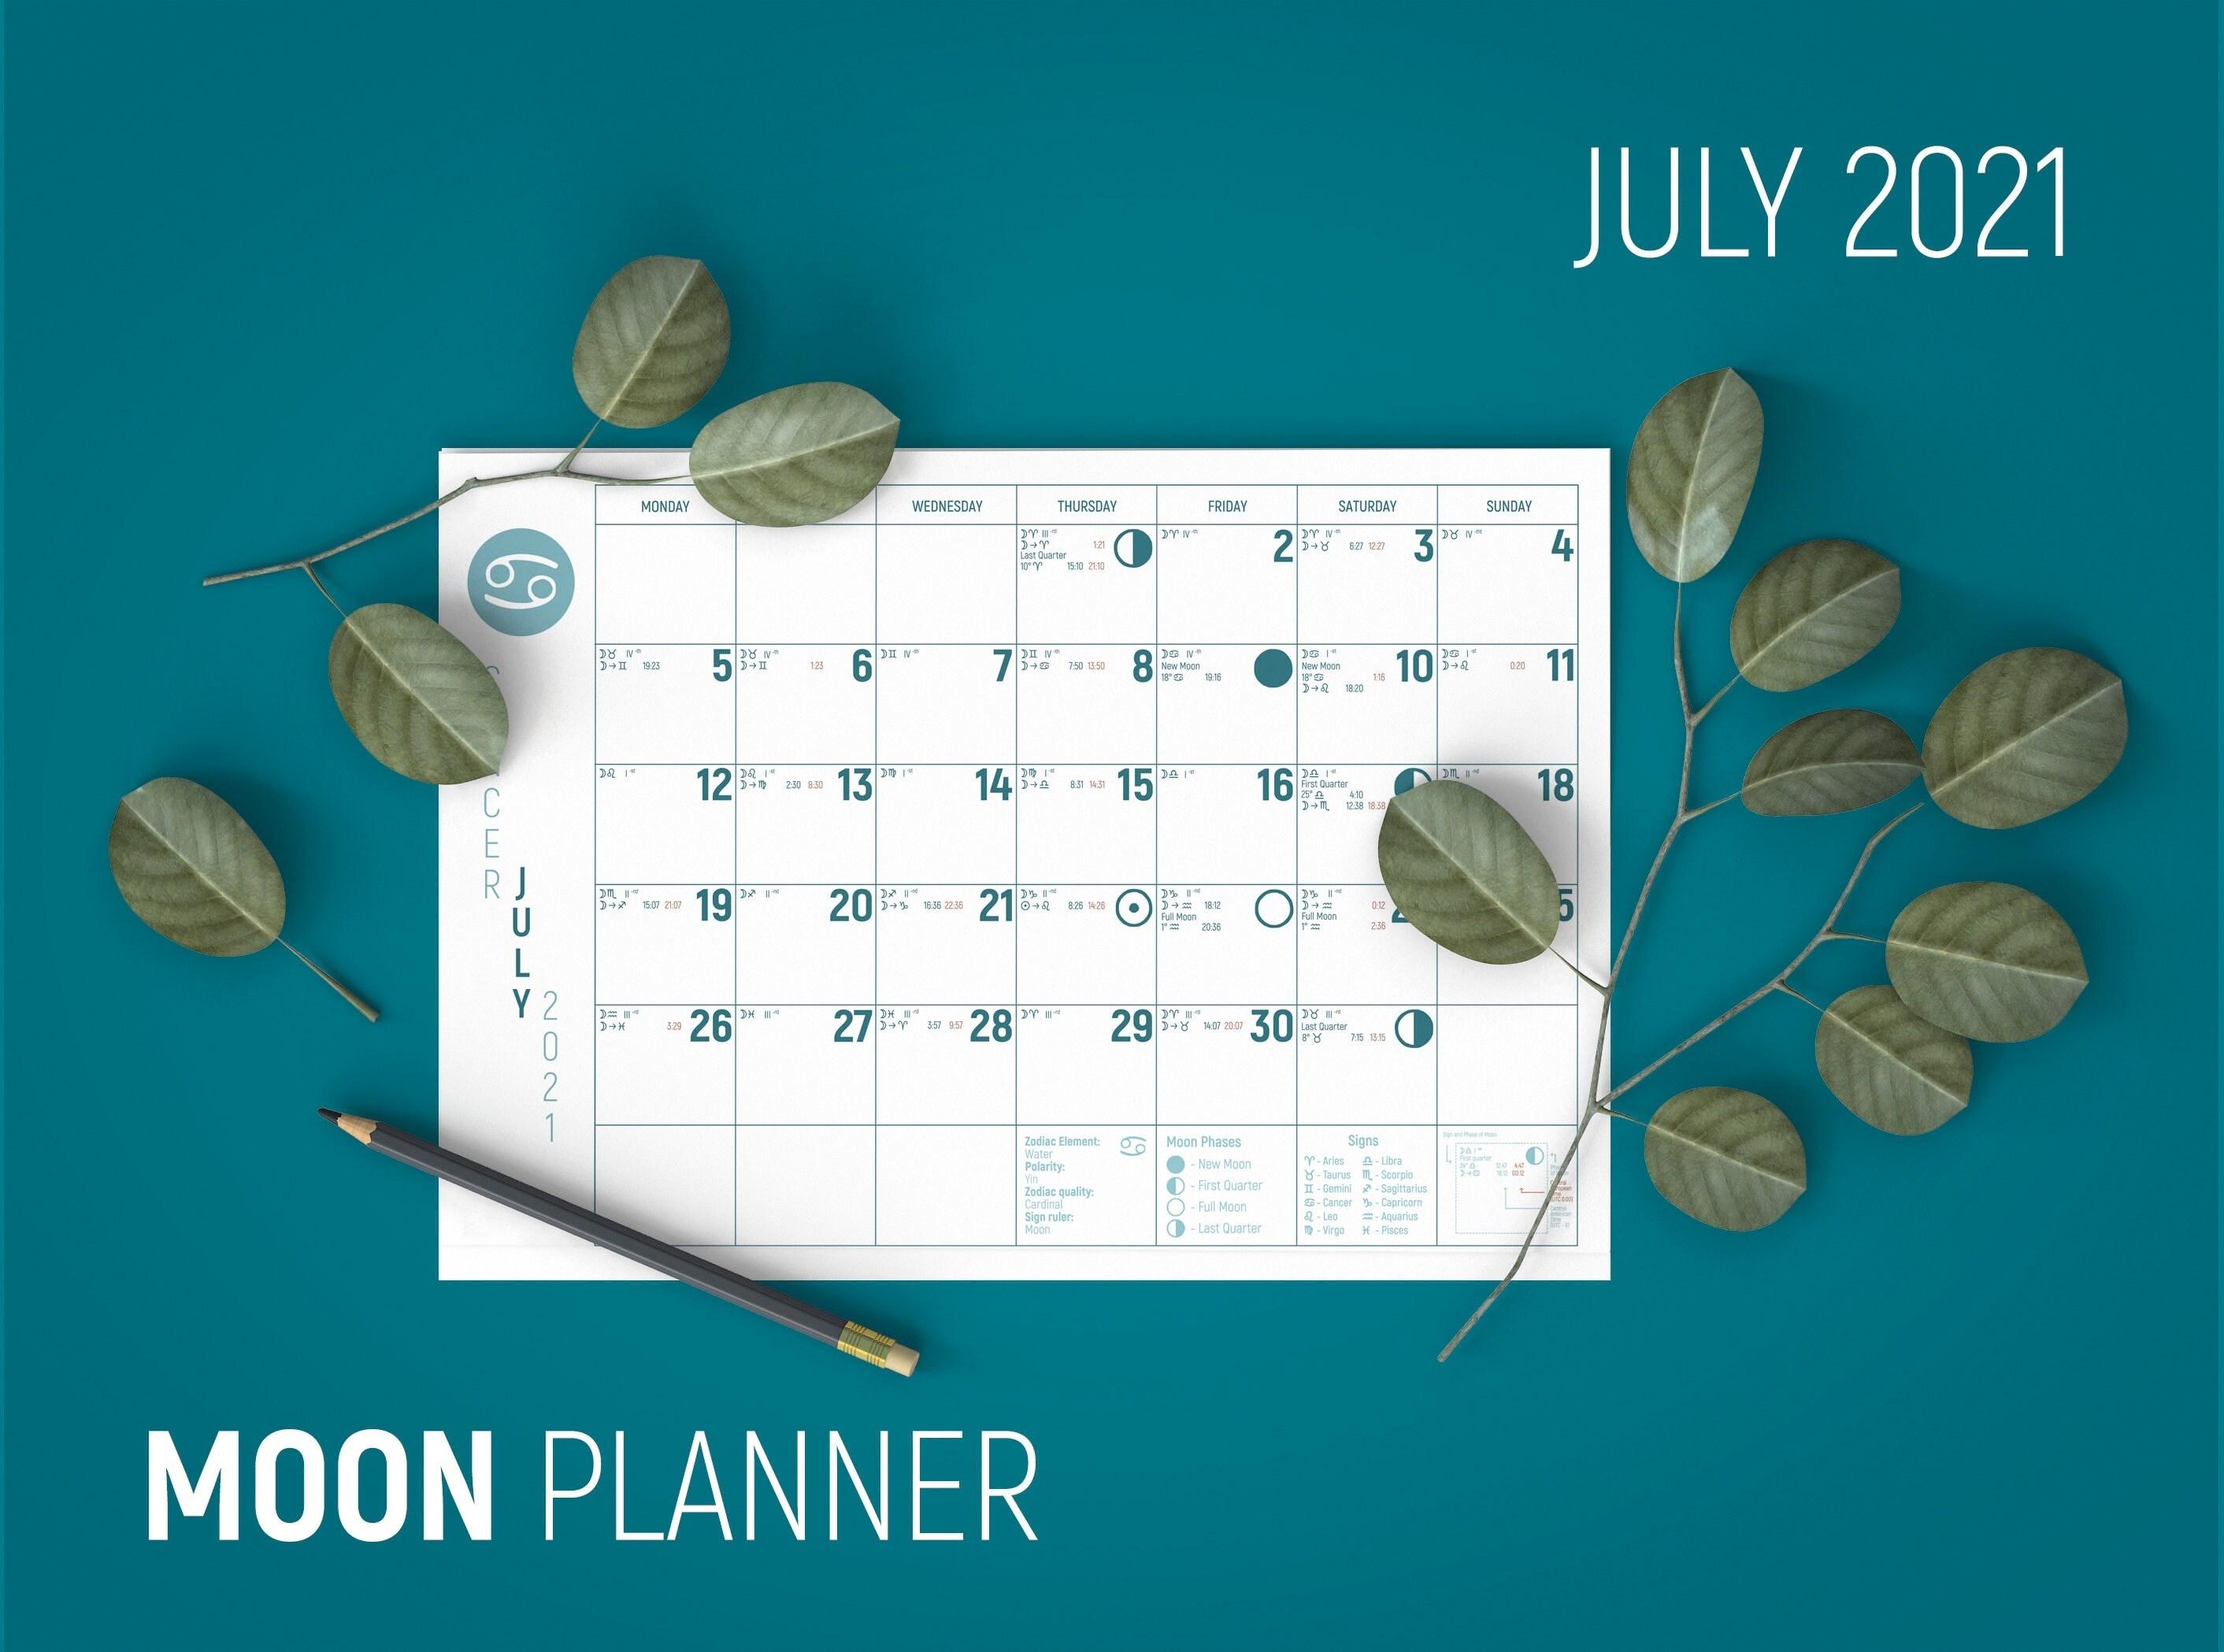 July Moon Calendar Astrology Planner 2021 July Planner | Etsy July 2021 Lunar Calendar